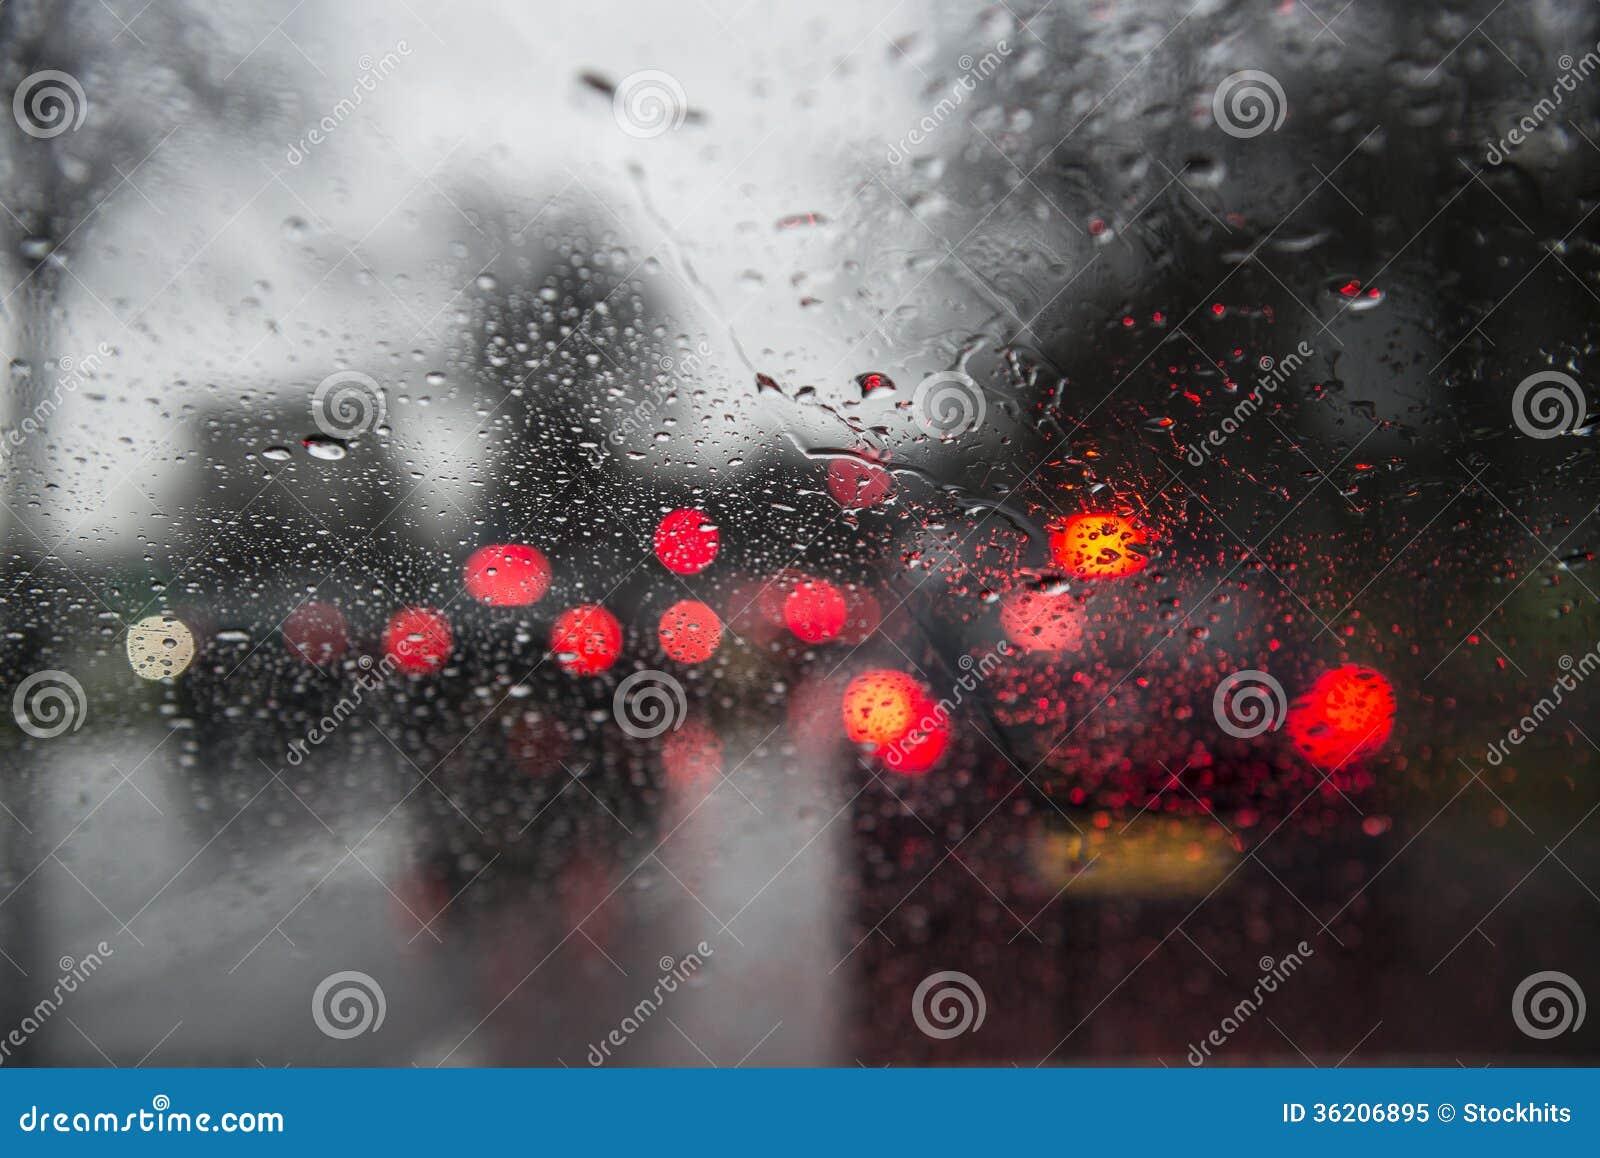 Rainy Car Windscreen Stock Image Image Of Traffic Brakes 36206895